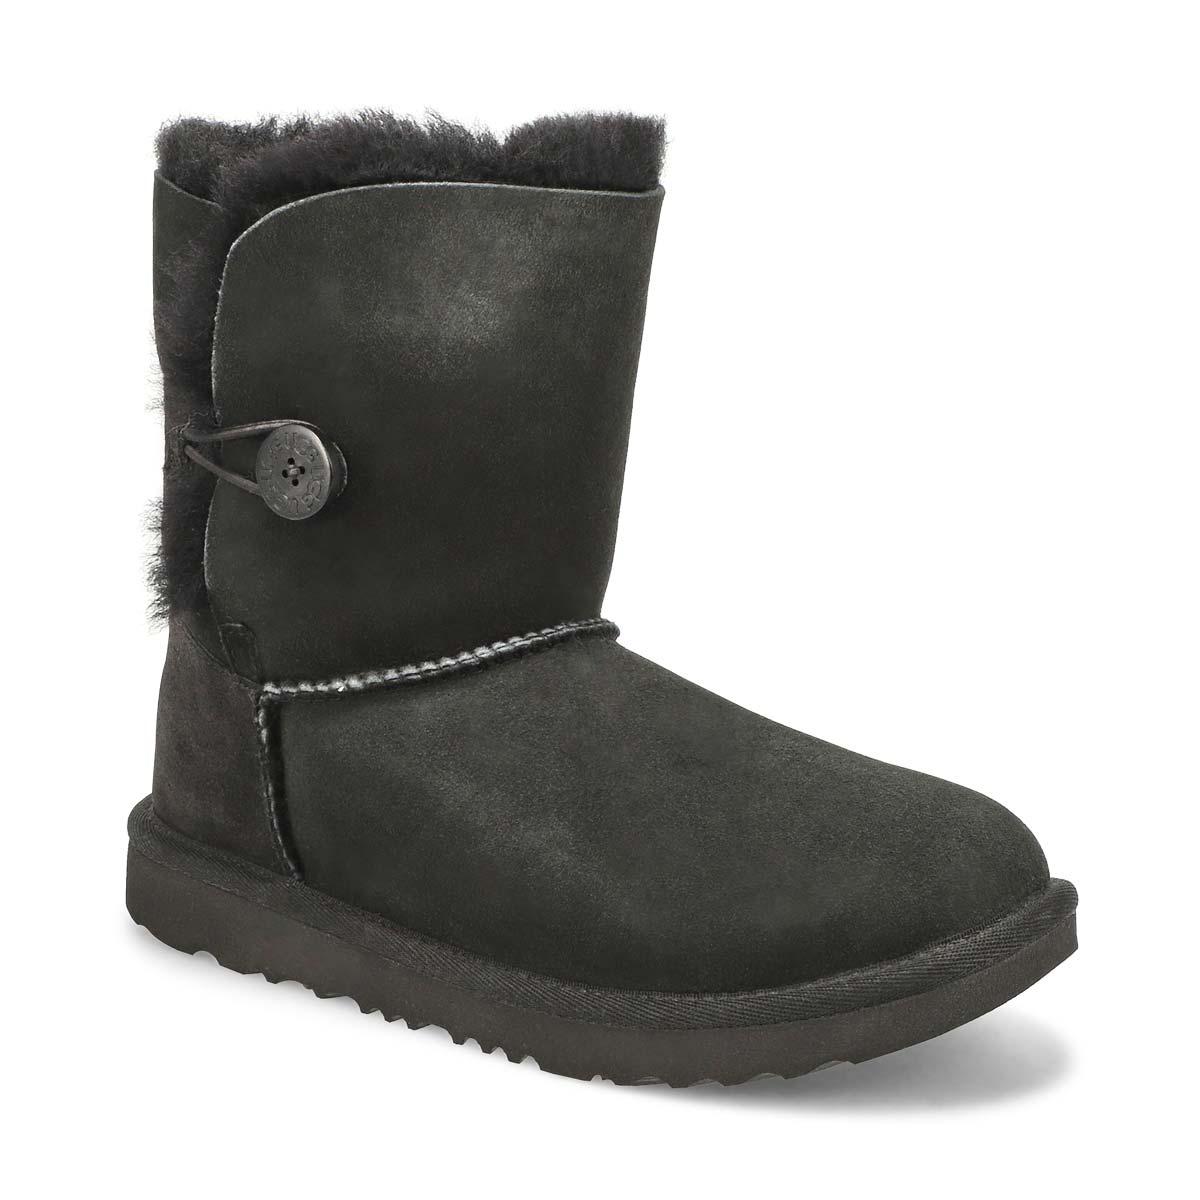 50a4b83062c Girls' BAILEY BUTTON II black sheepskin boots